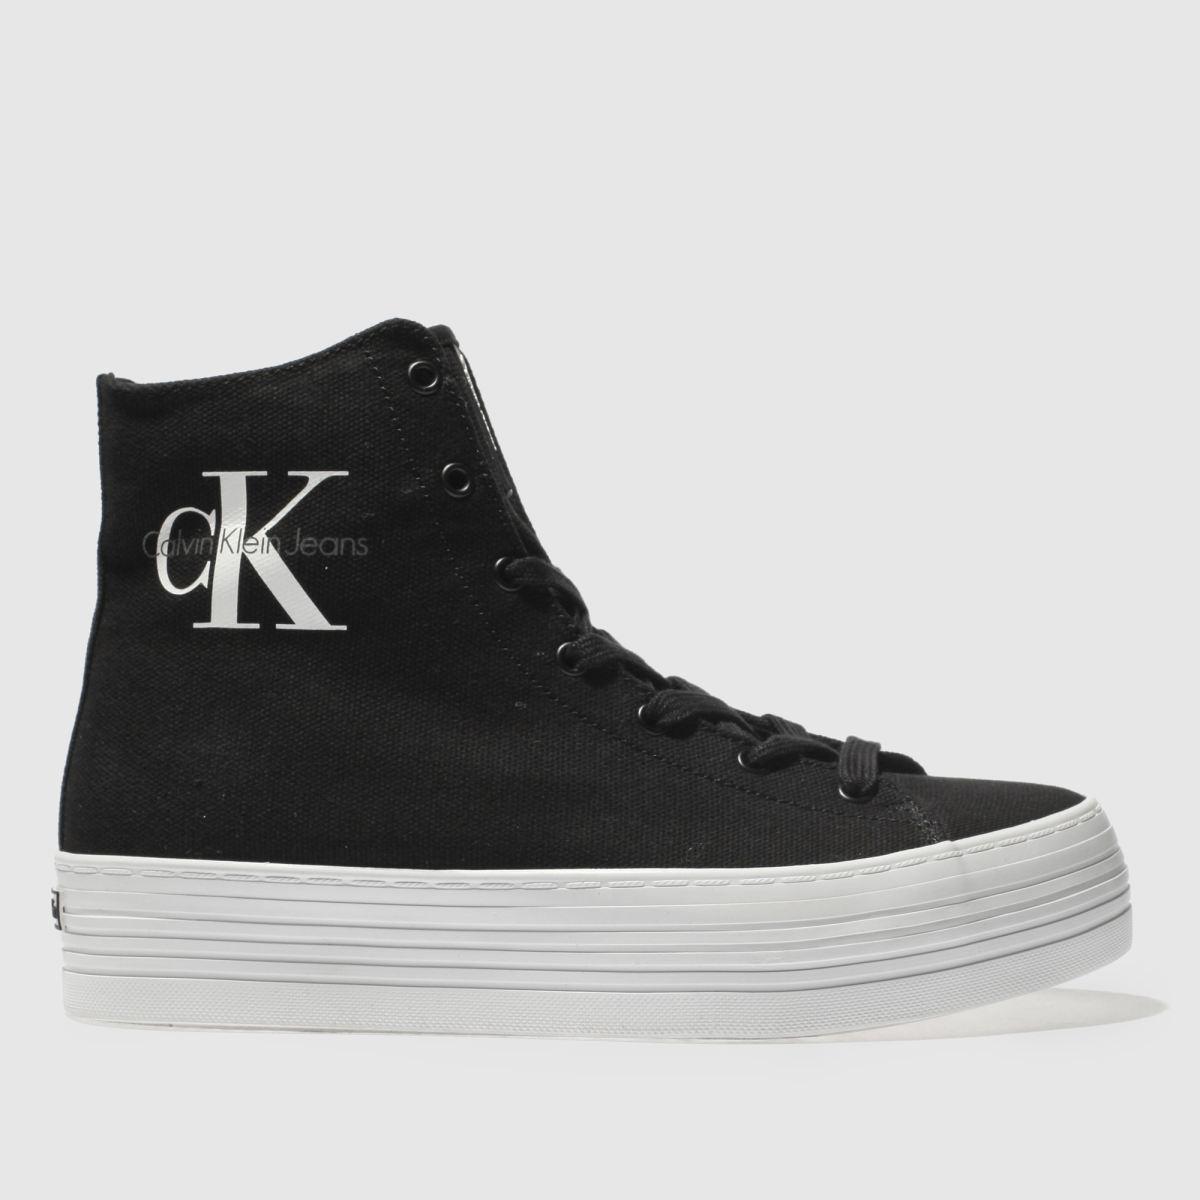 Calvin Klein Black & White Jeans Zabrina Canvas Trainers